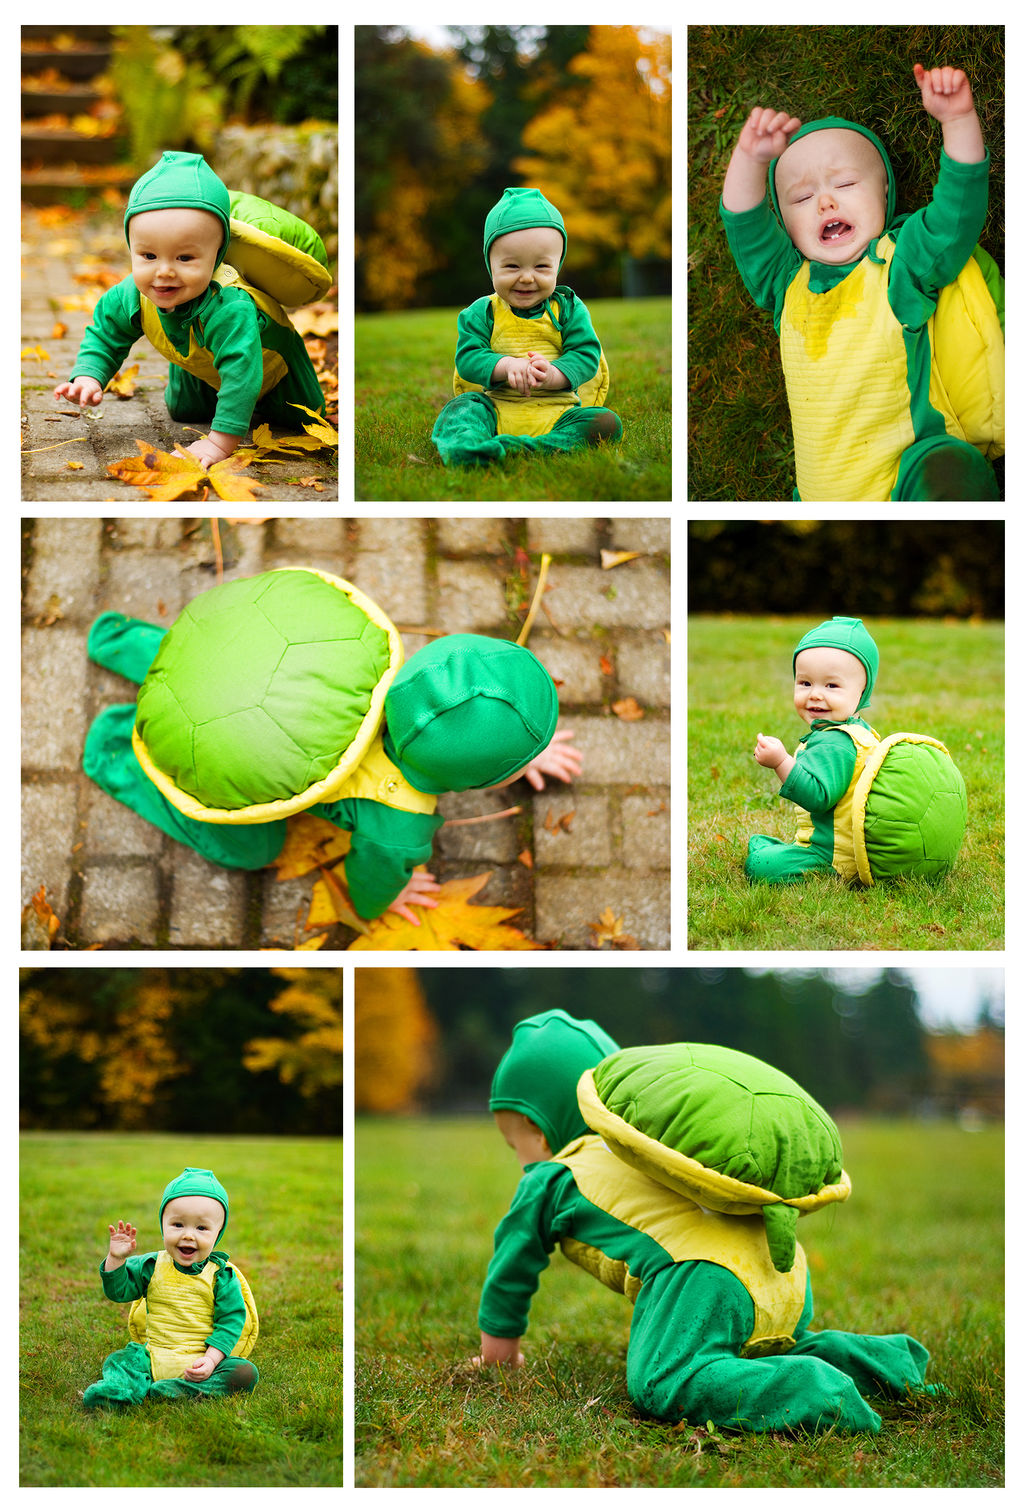 Turtlebaby